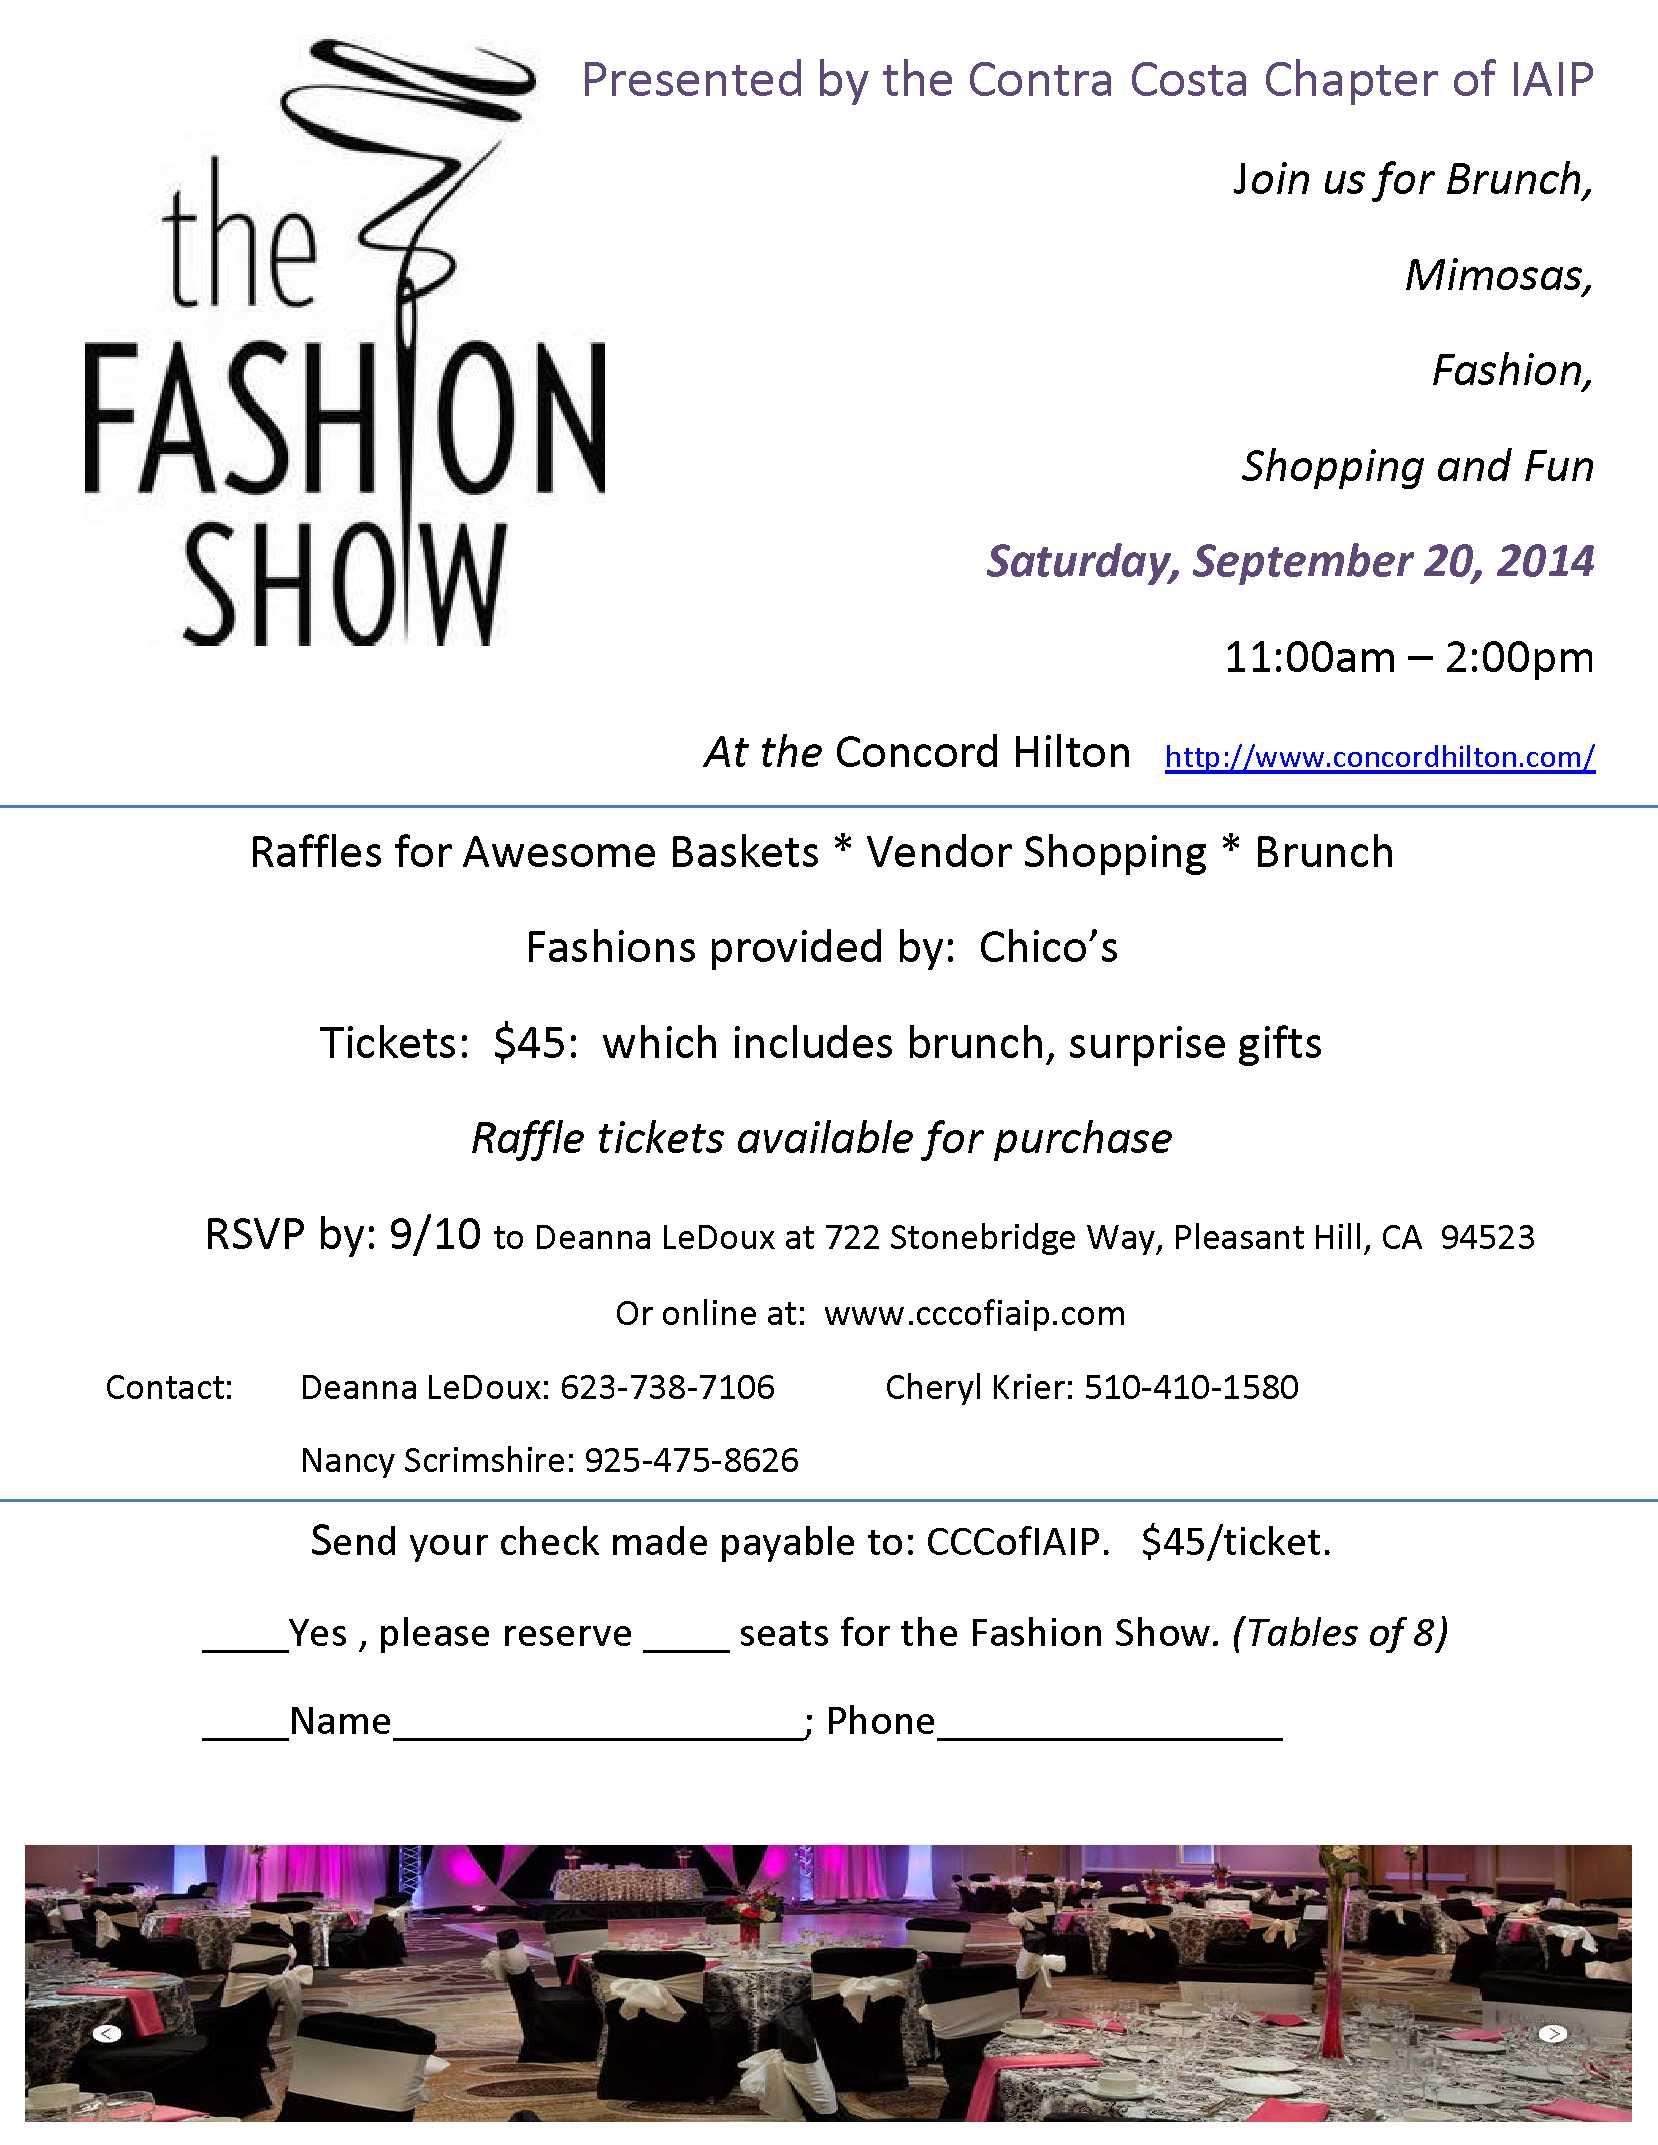 2014-009 CCCIAIP Fashion Show 9 20 14 Flyer.jpg